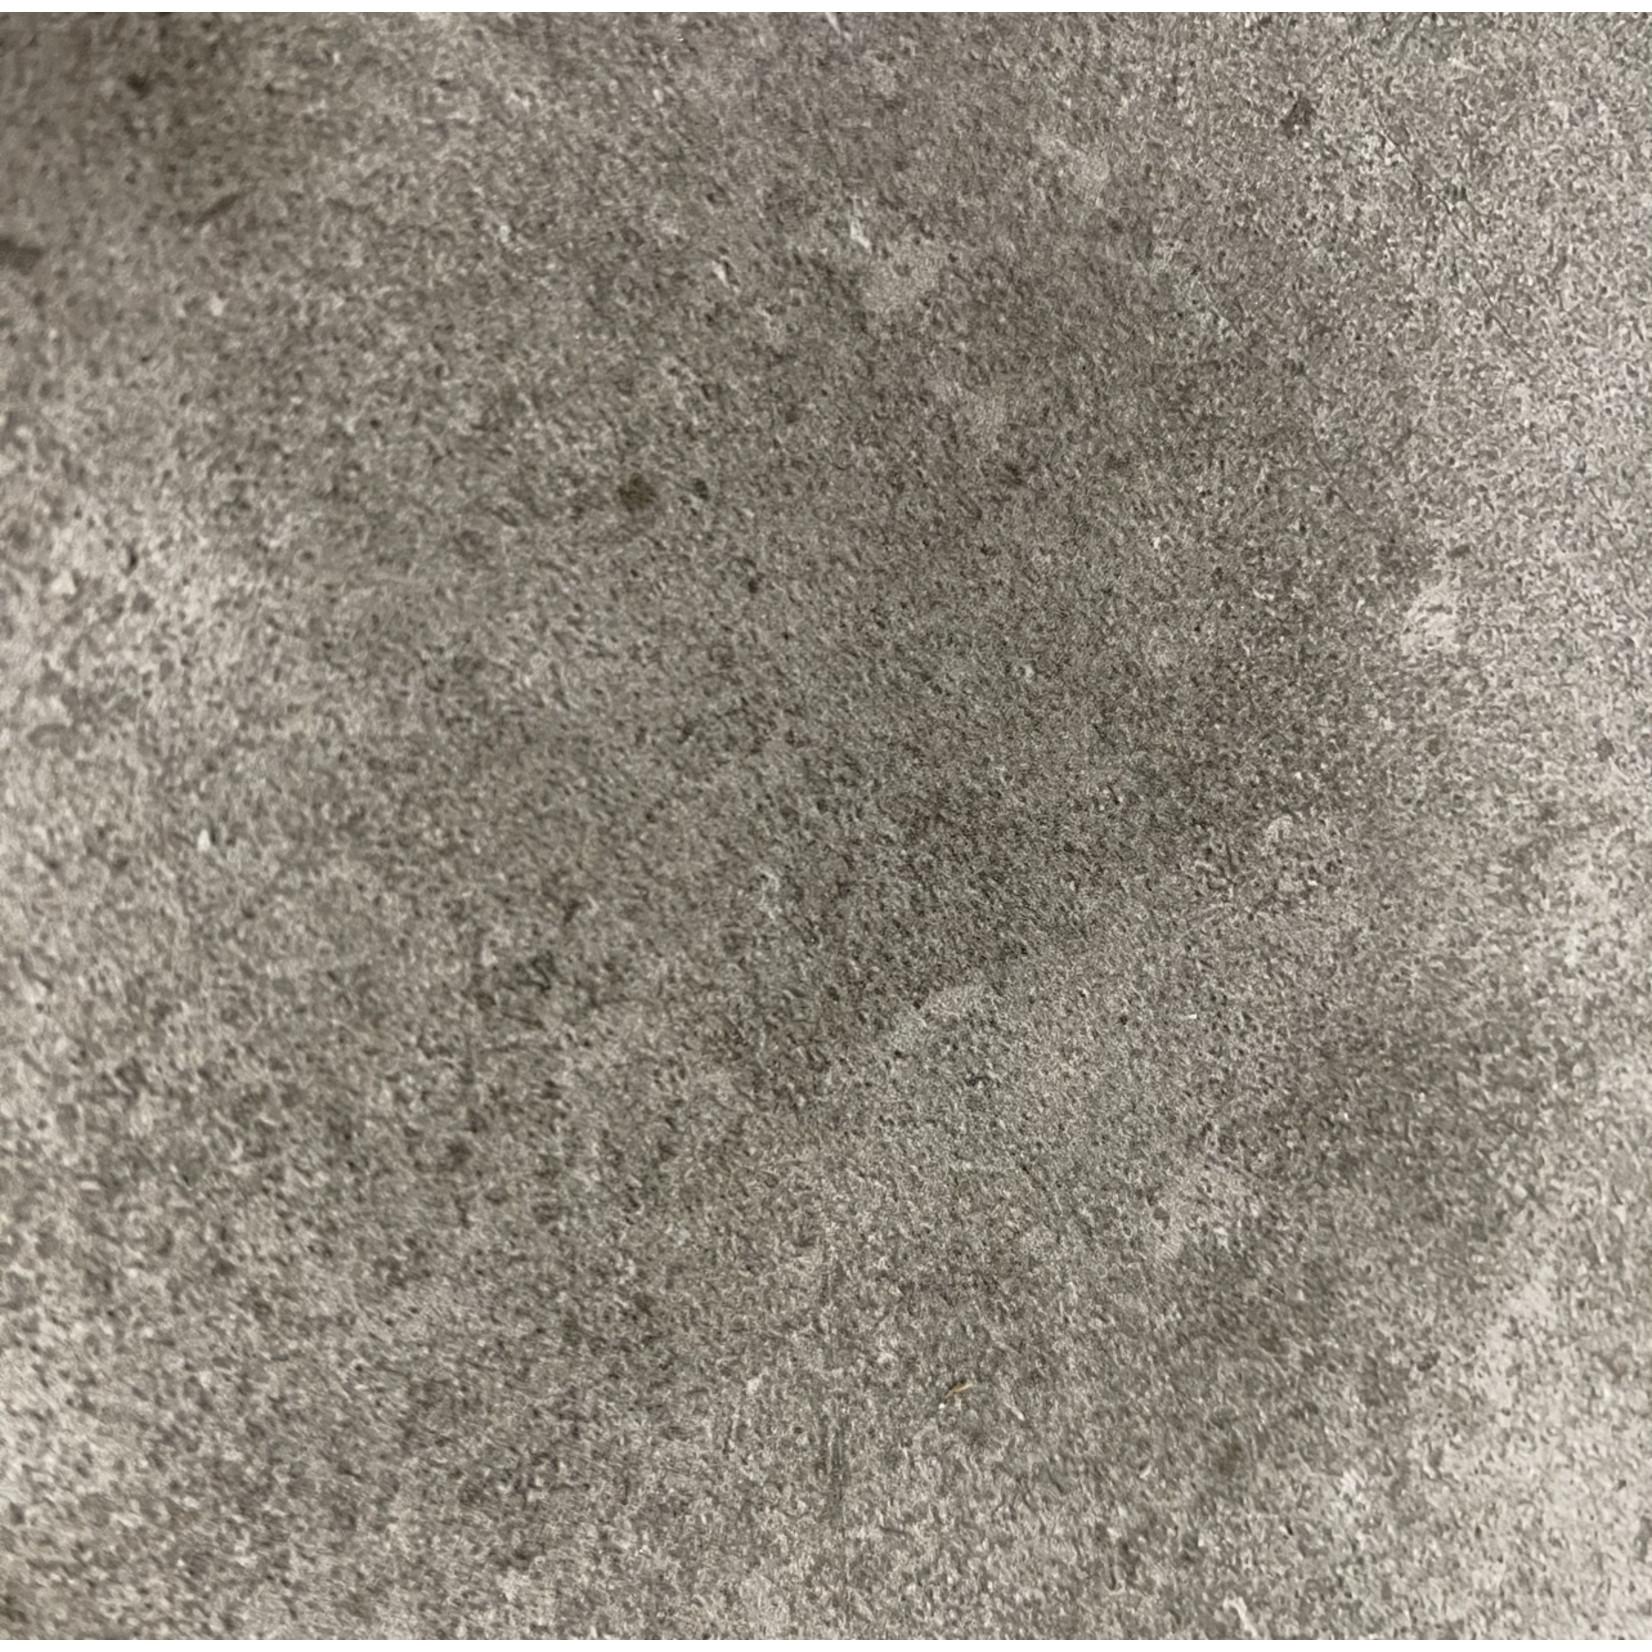 10077 120 sq ft Of Elaganza Limestone Tile